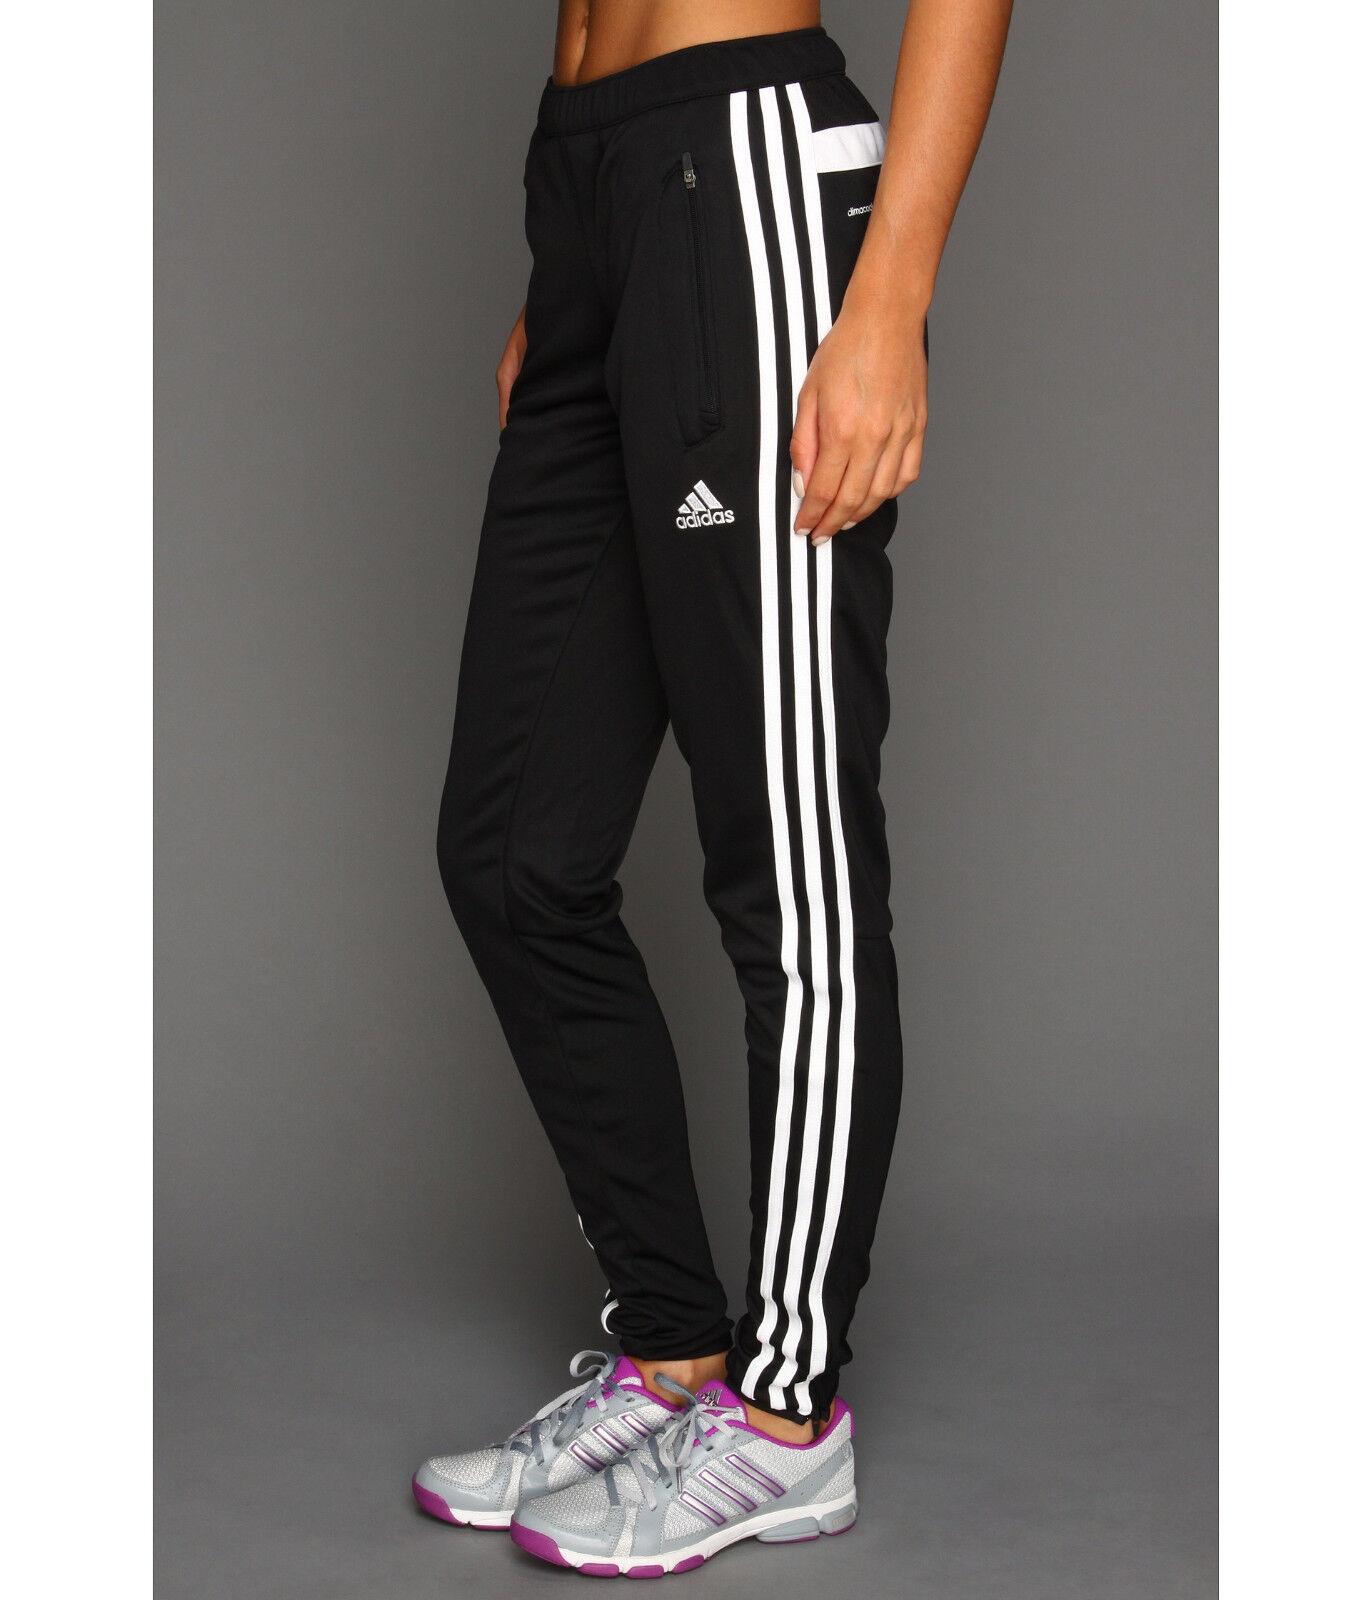 adidas pants new